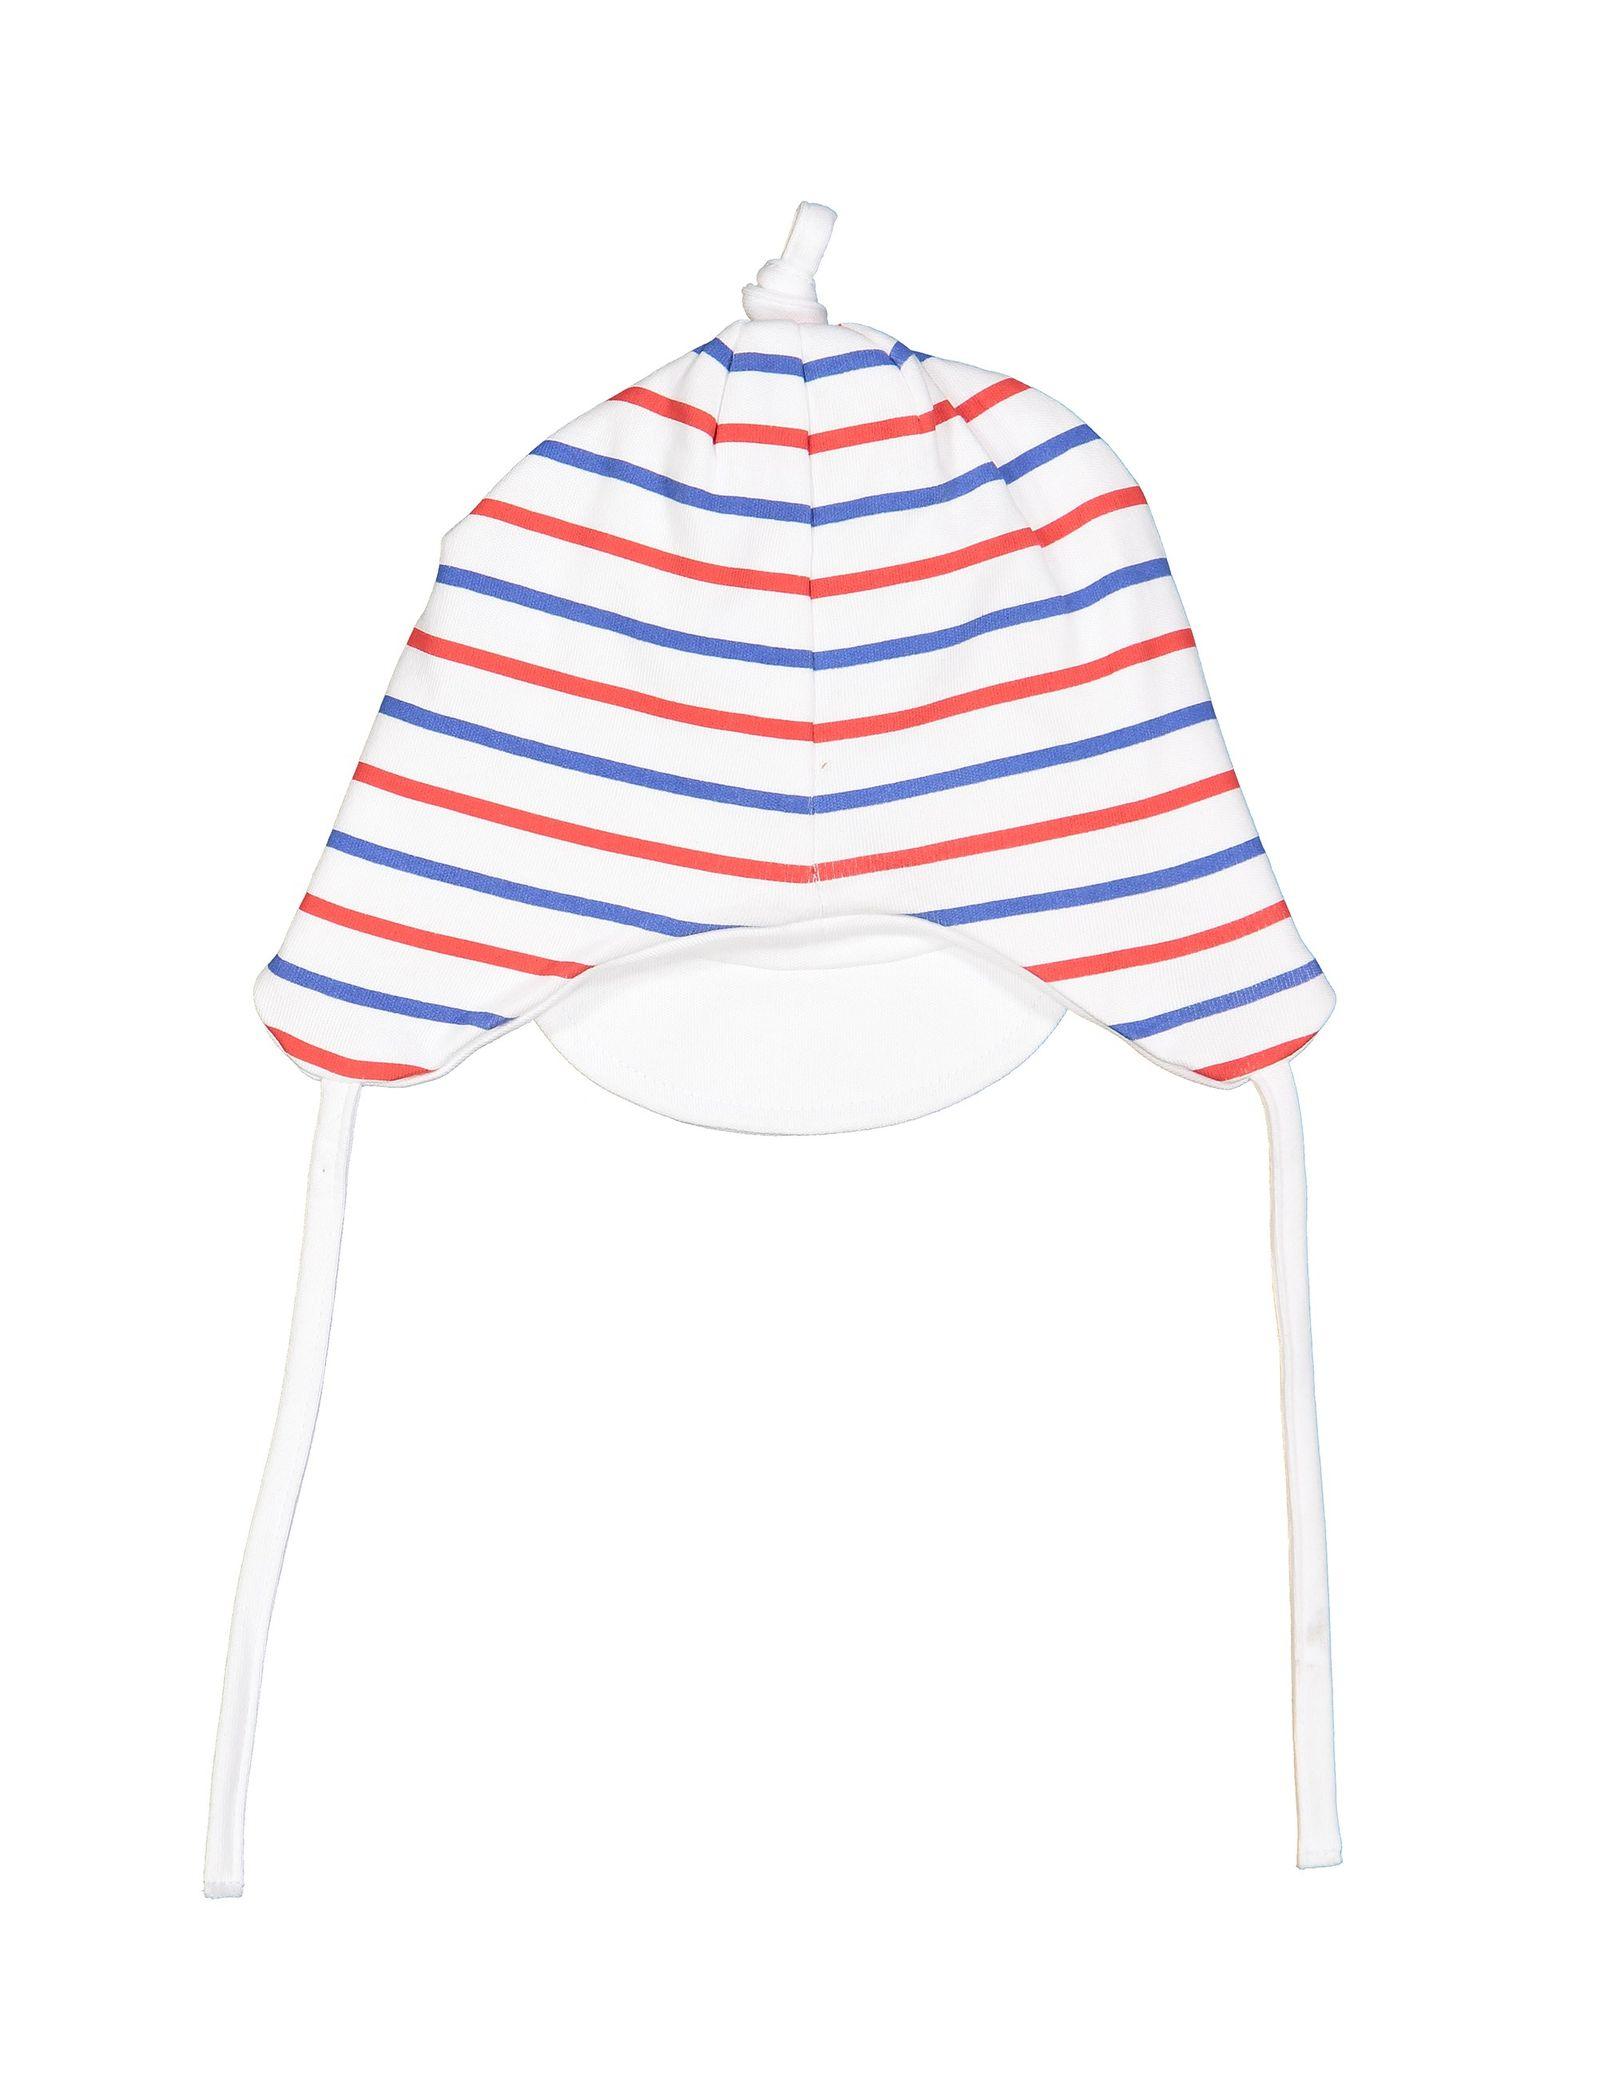 کلاه نخی طرح دار نوزادی پسرانه - ایدکس - سفيد - 2